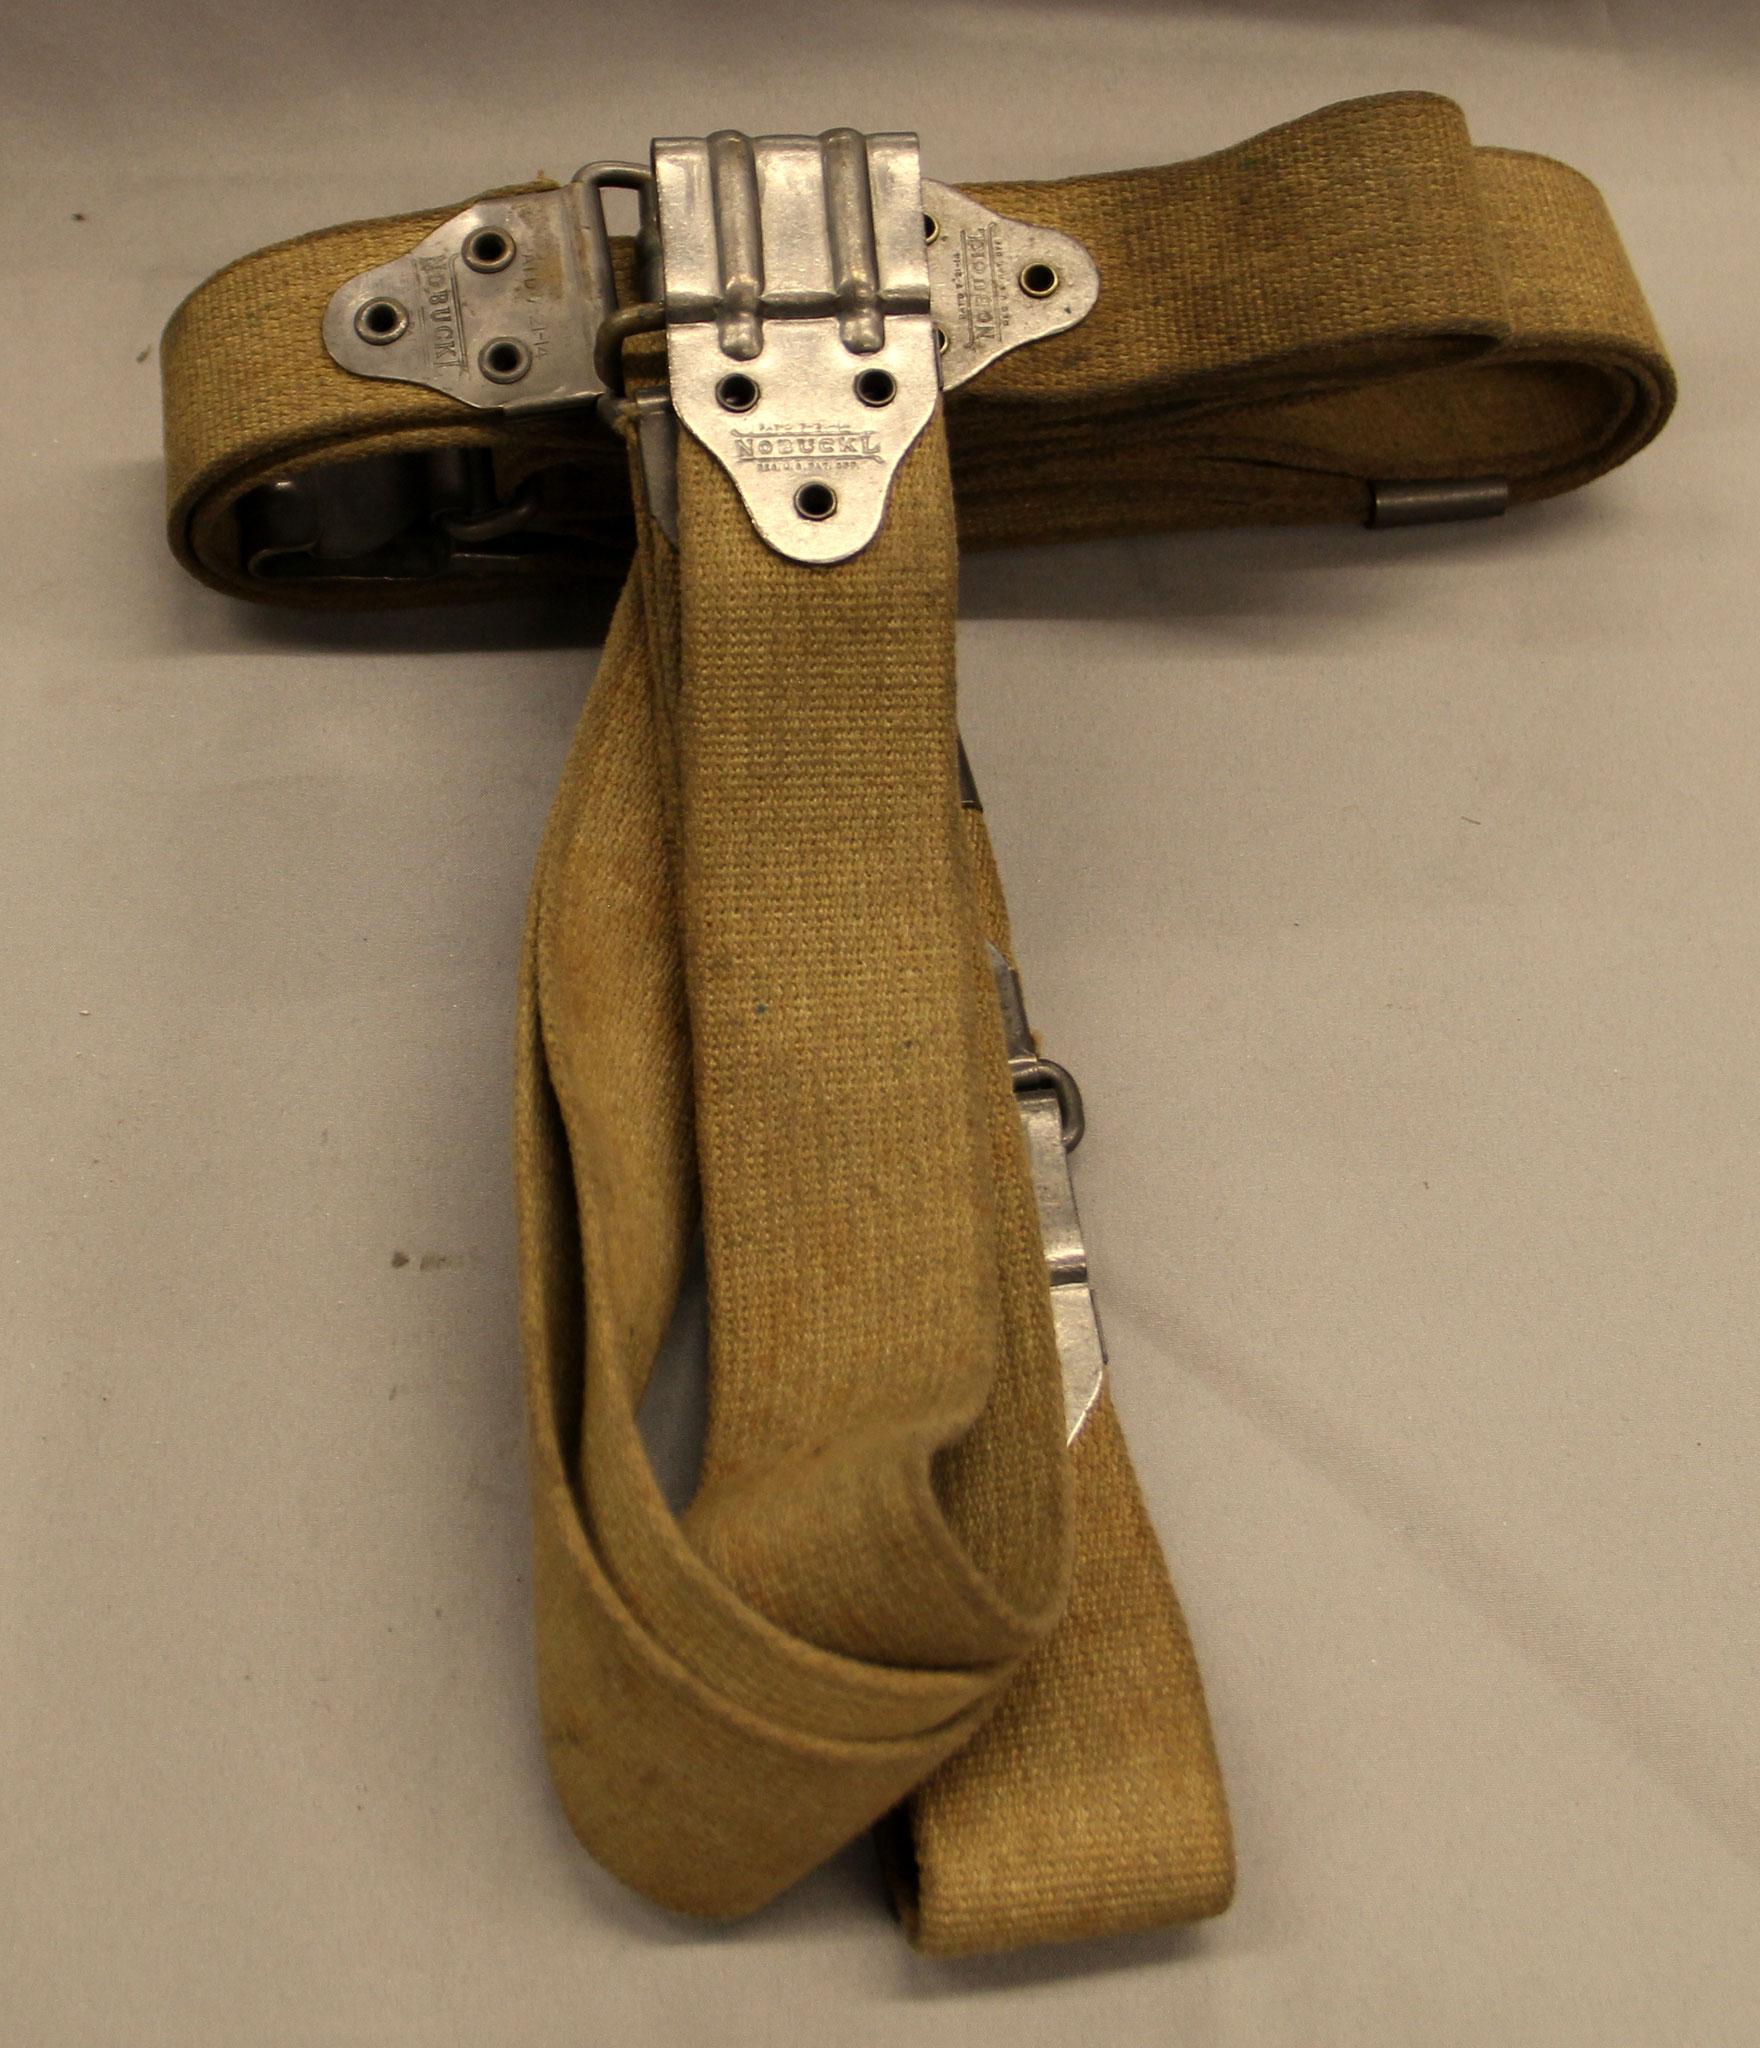 Originele Thompson M1928 sling. UITVERKOCHT